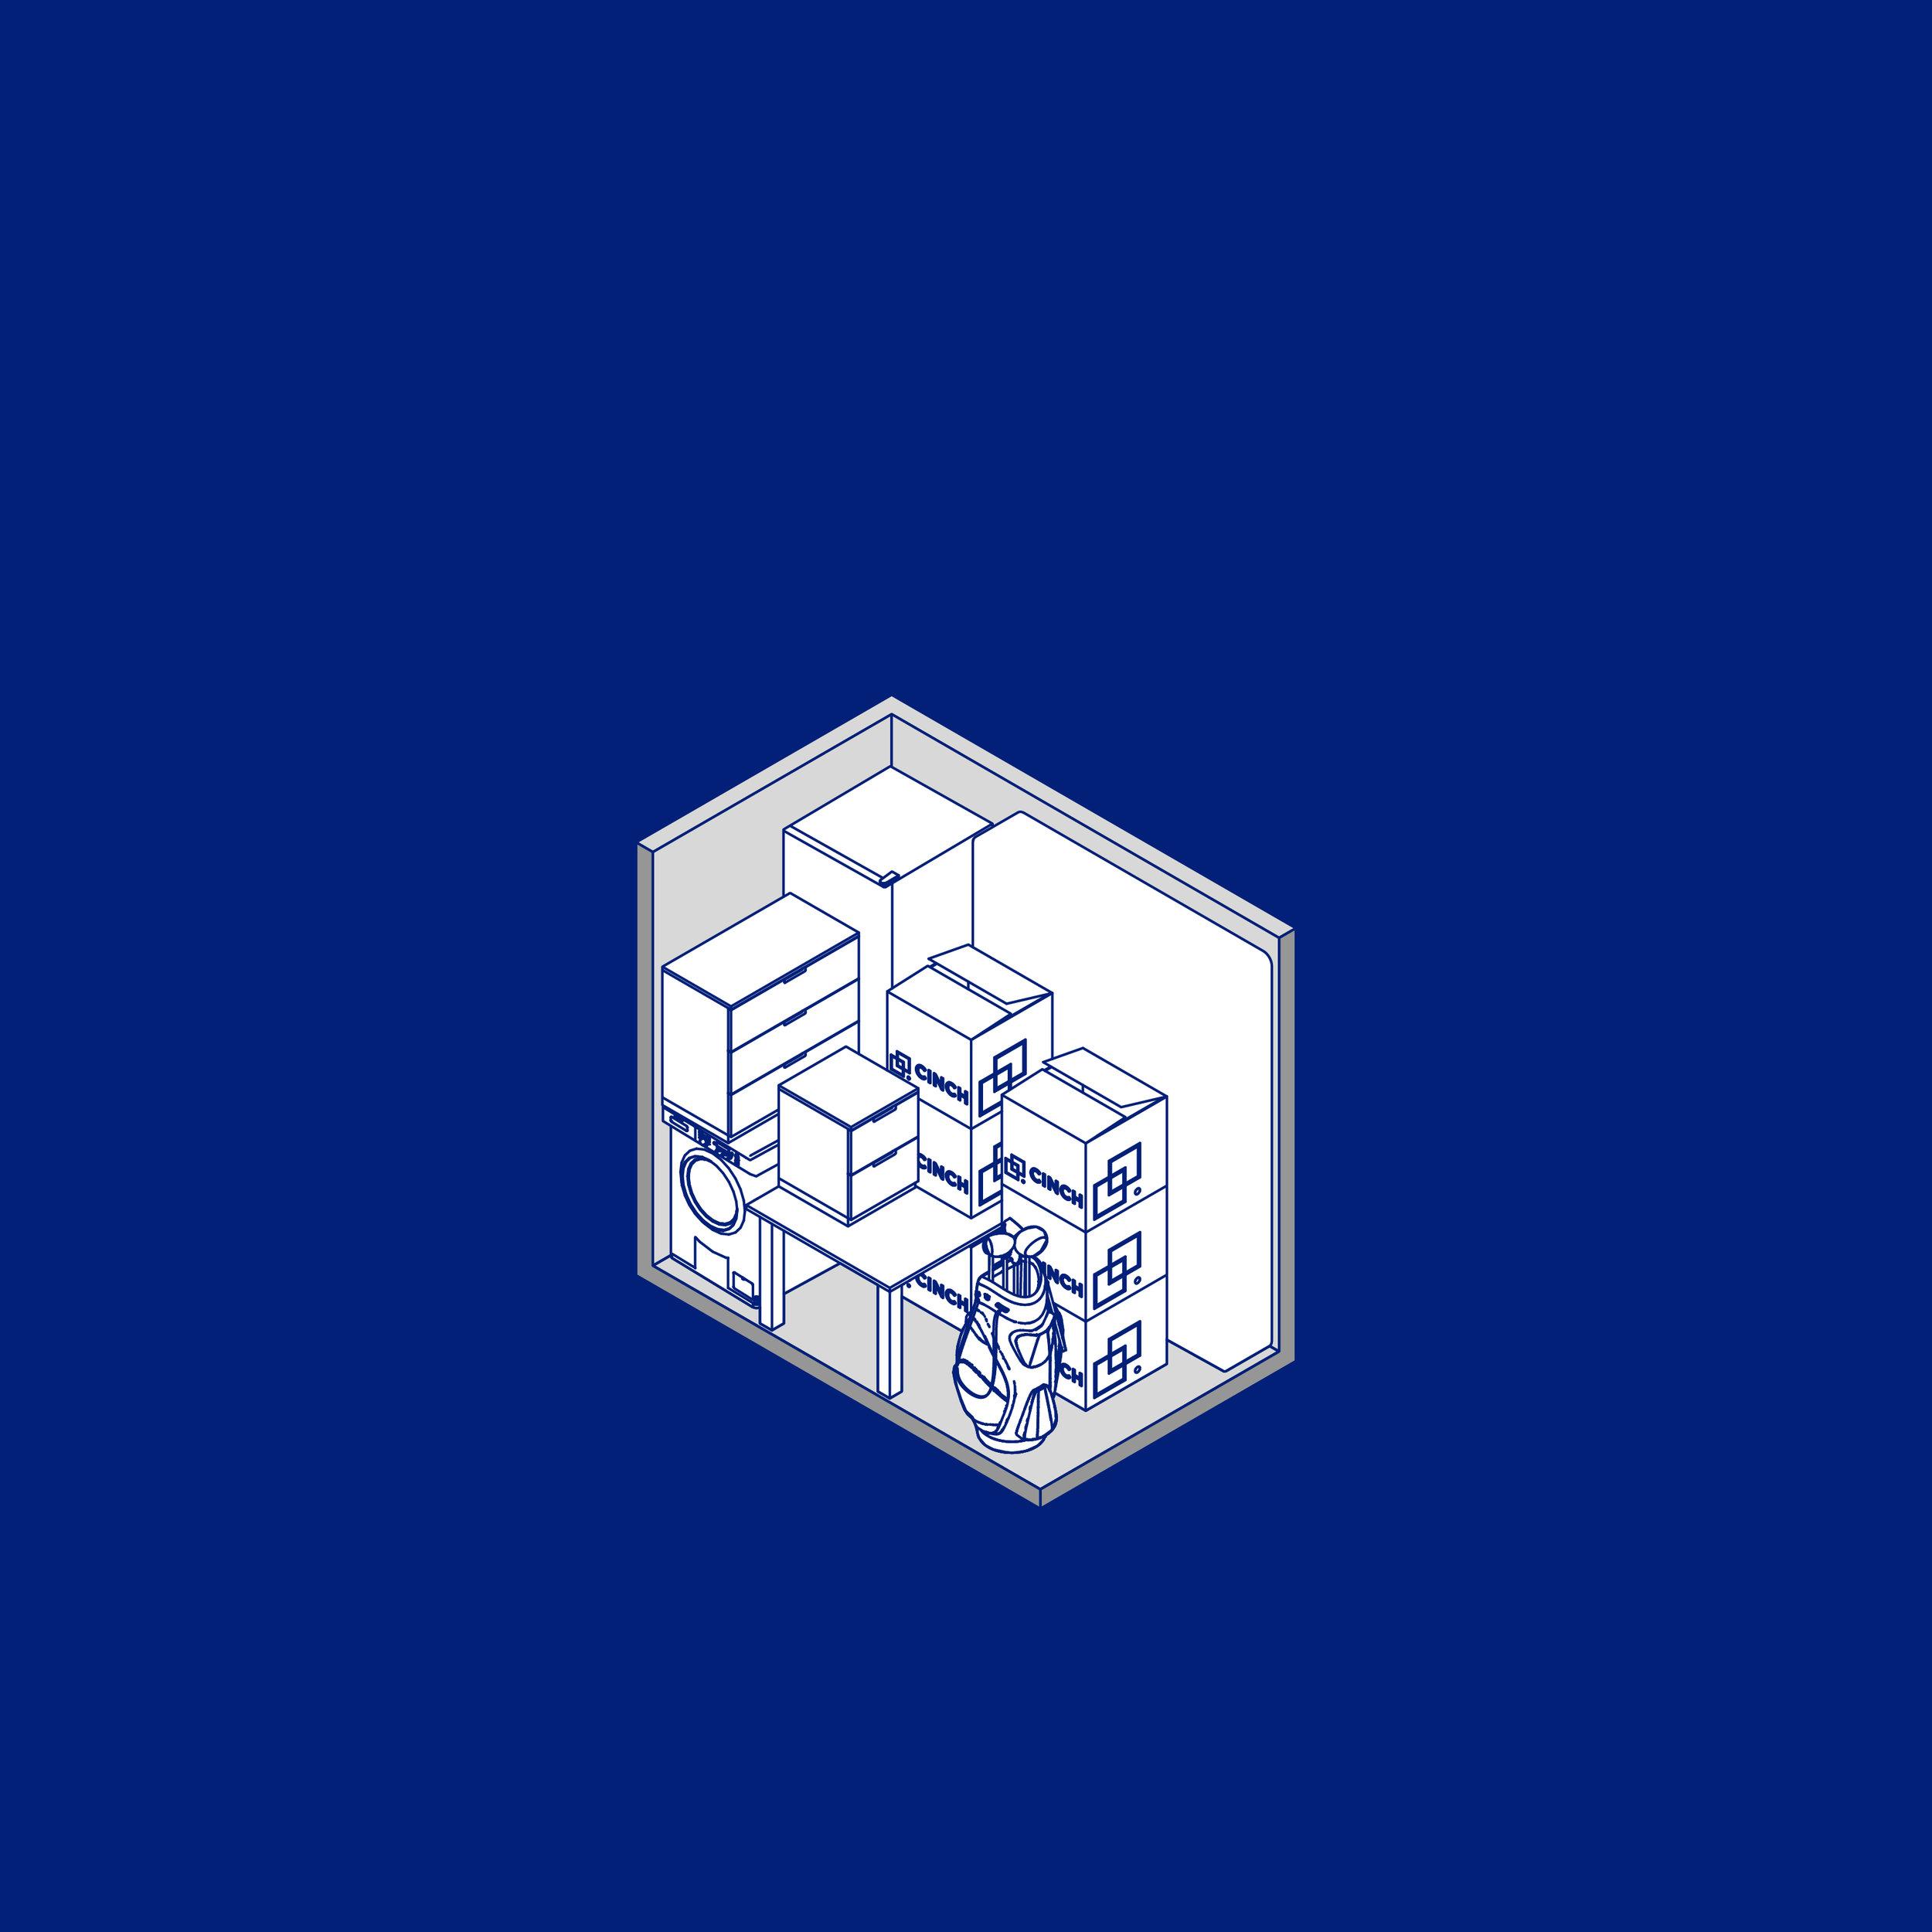 Bolter design icon design for Cinch Concierge Storage